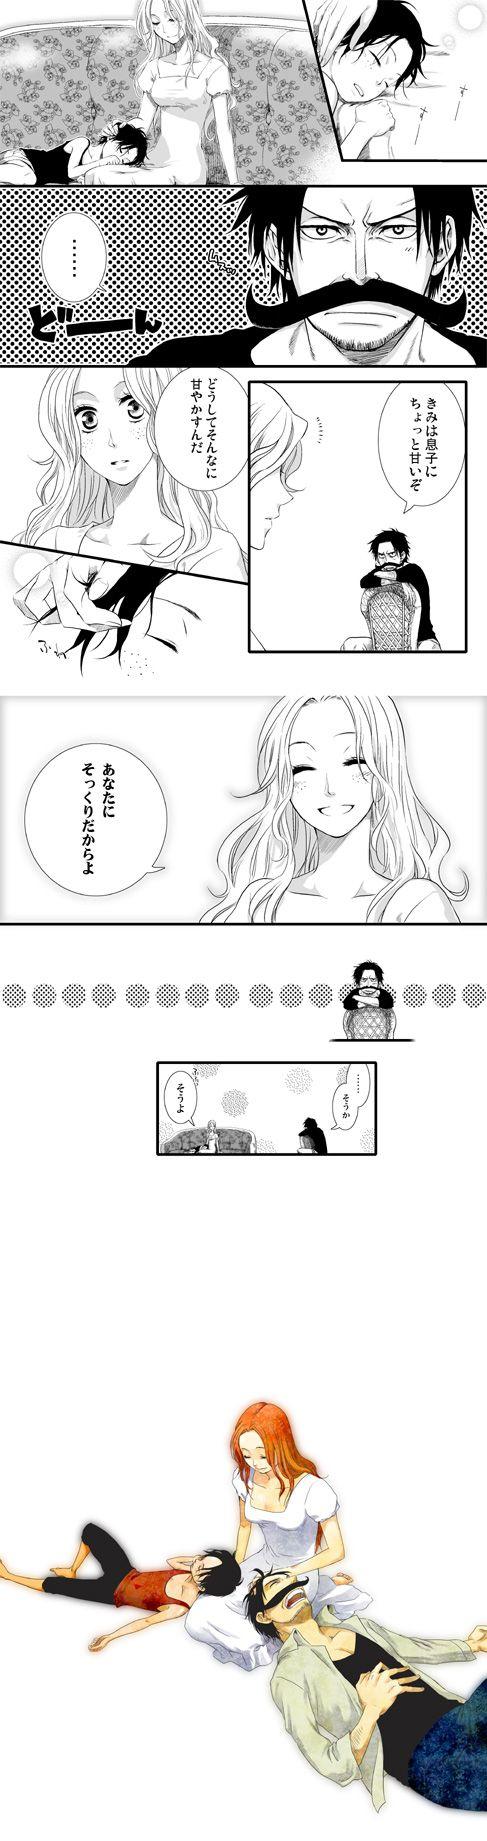 Tags: Anime, ONE PIECE, Portgas D. Ace, Gol D. Roger, Portgas D. Rouge #onepiece